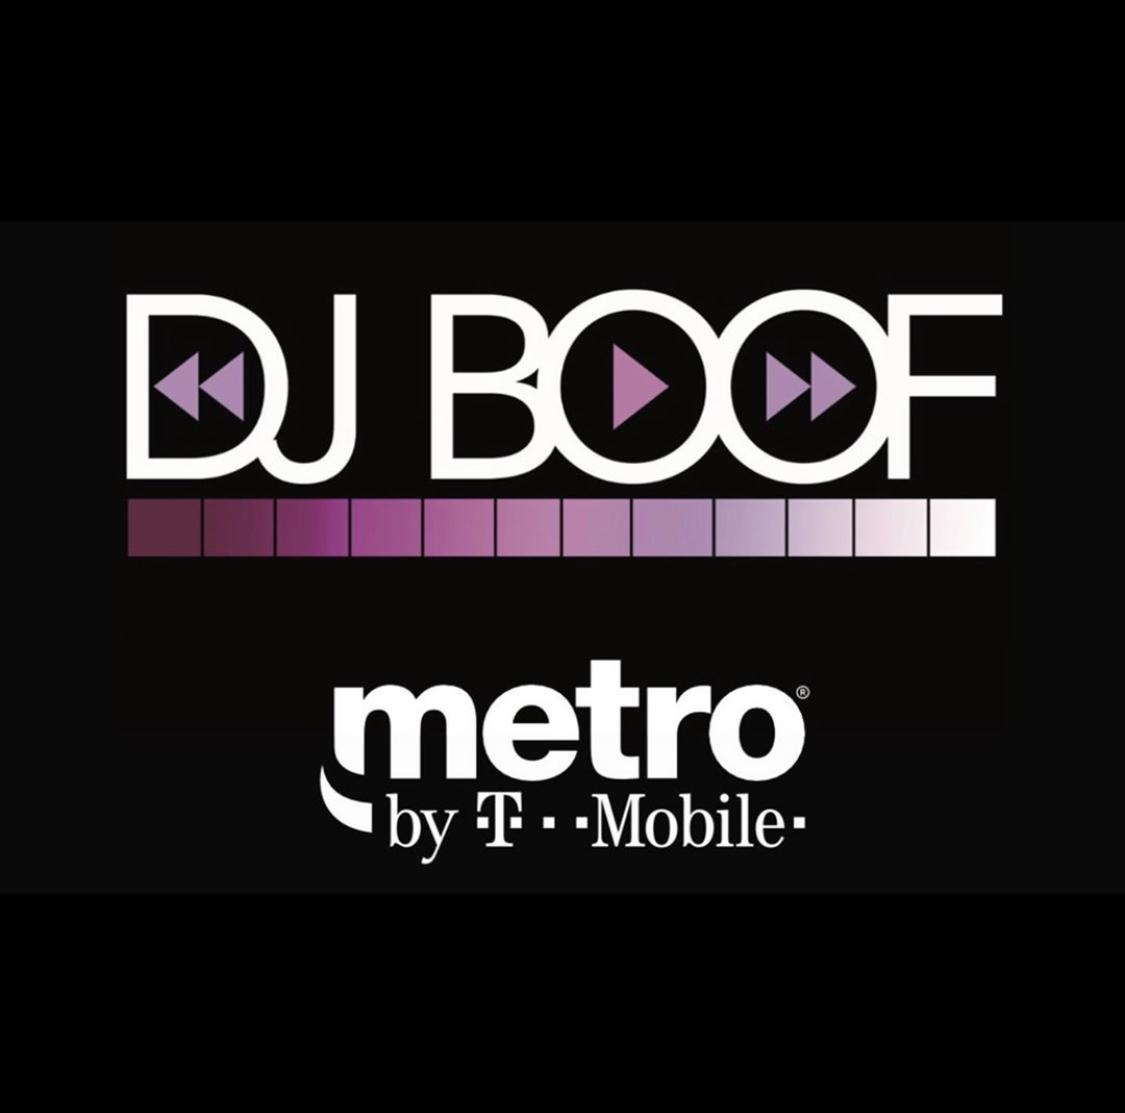 DJ BOOF COLLAB WITH METRO PCS -